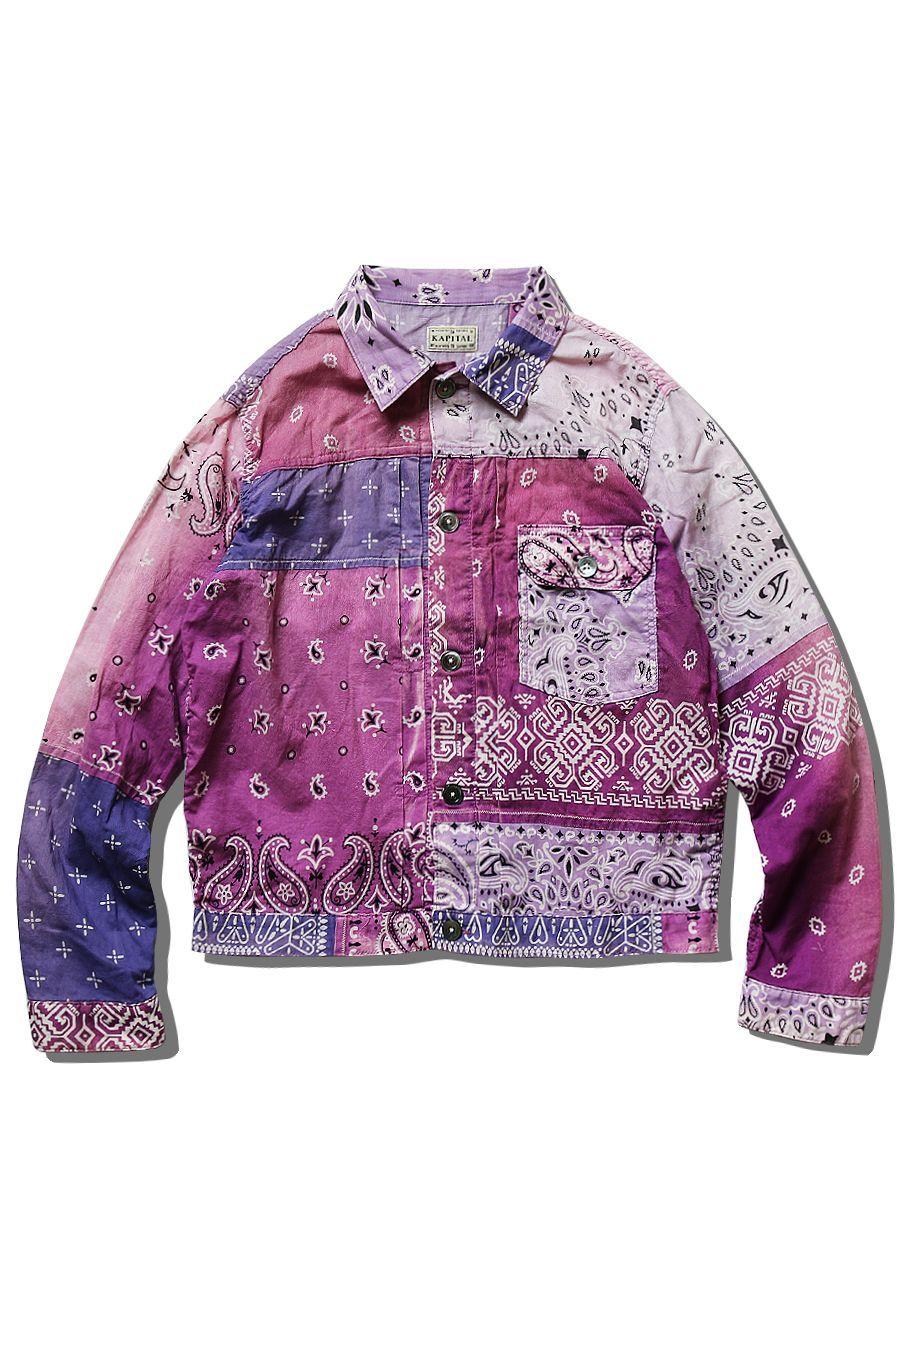 Kapital Delivers New Bandana Patchwork Jacket In Easter Ready Hues Fashion Patchwork Jacket Jackets [ 1350 x 900 Pixel ]